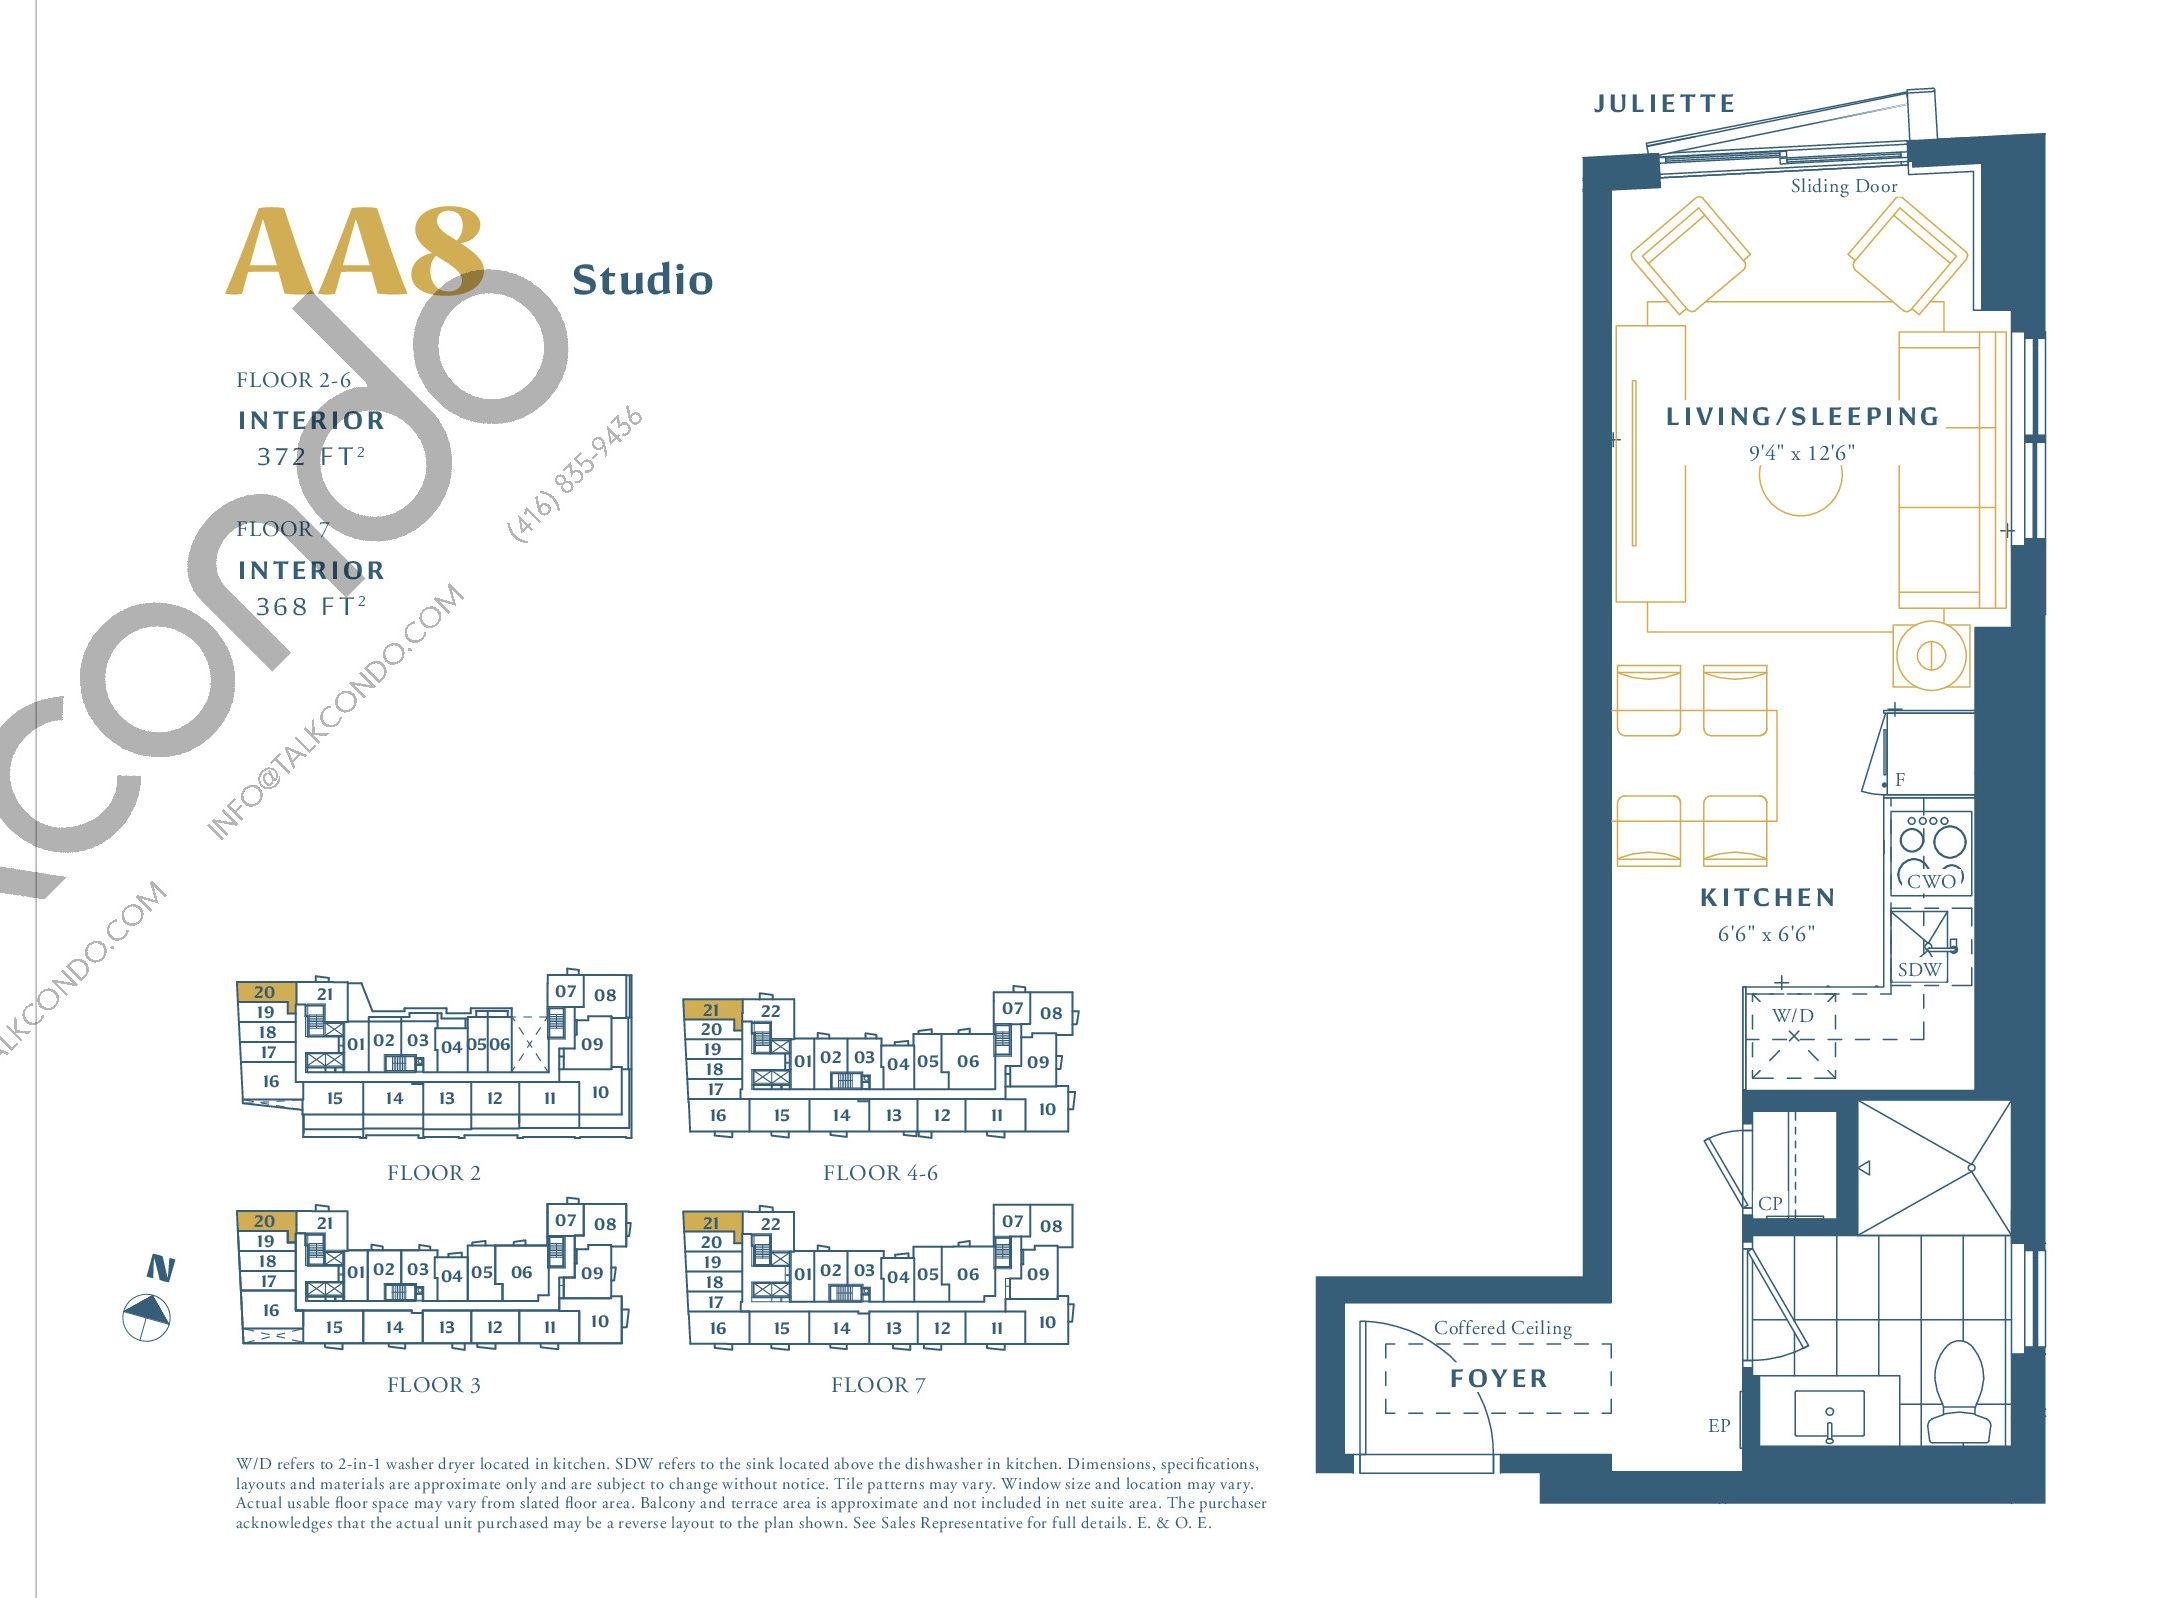 AA8 Floor Plan at The Borough Condos - Tower A - 372 sq.ft